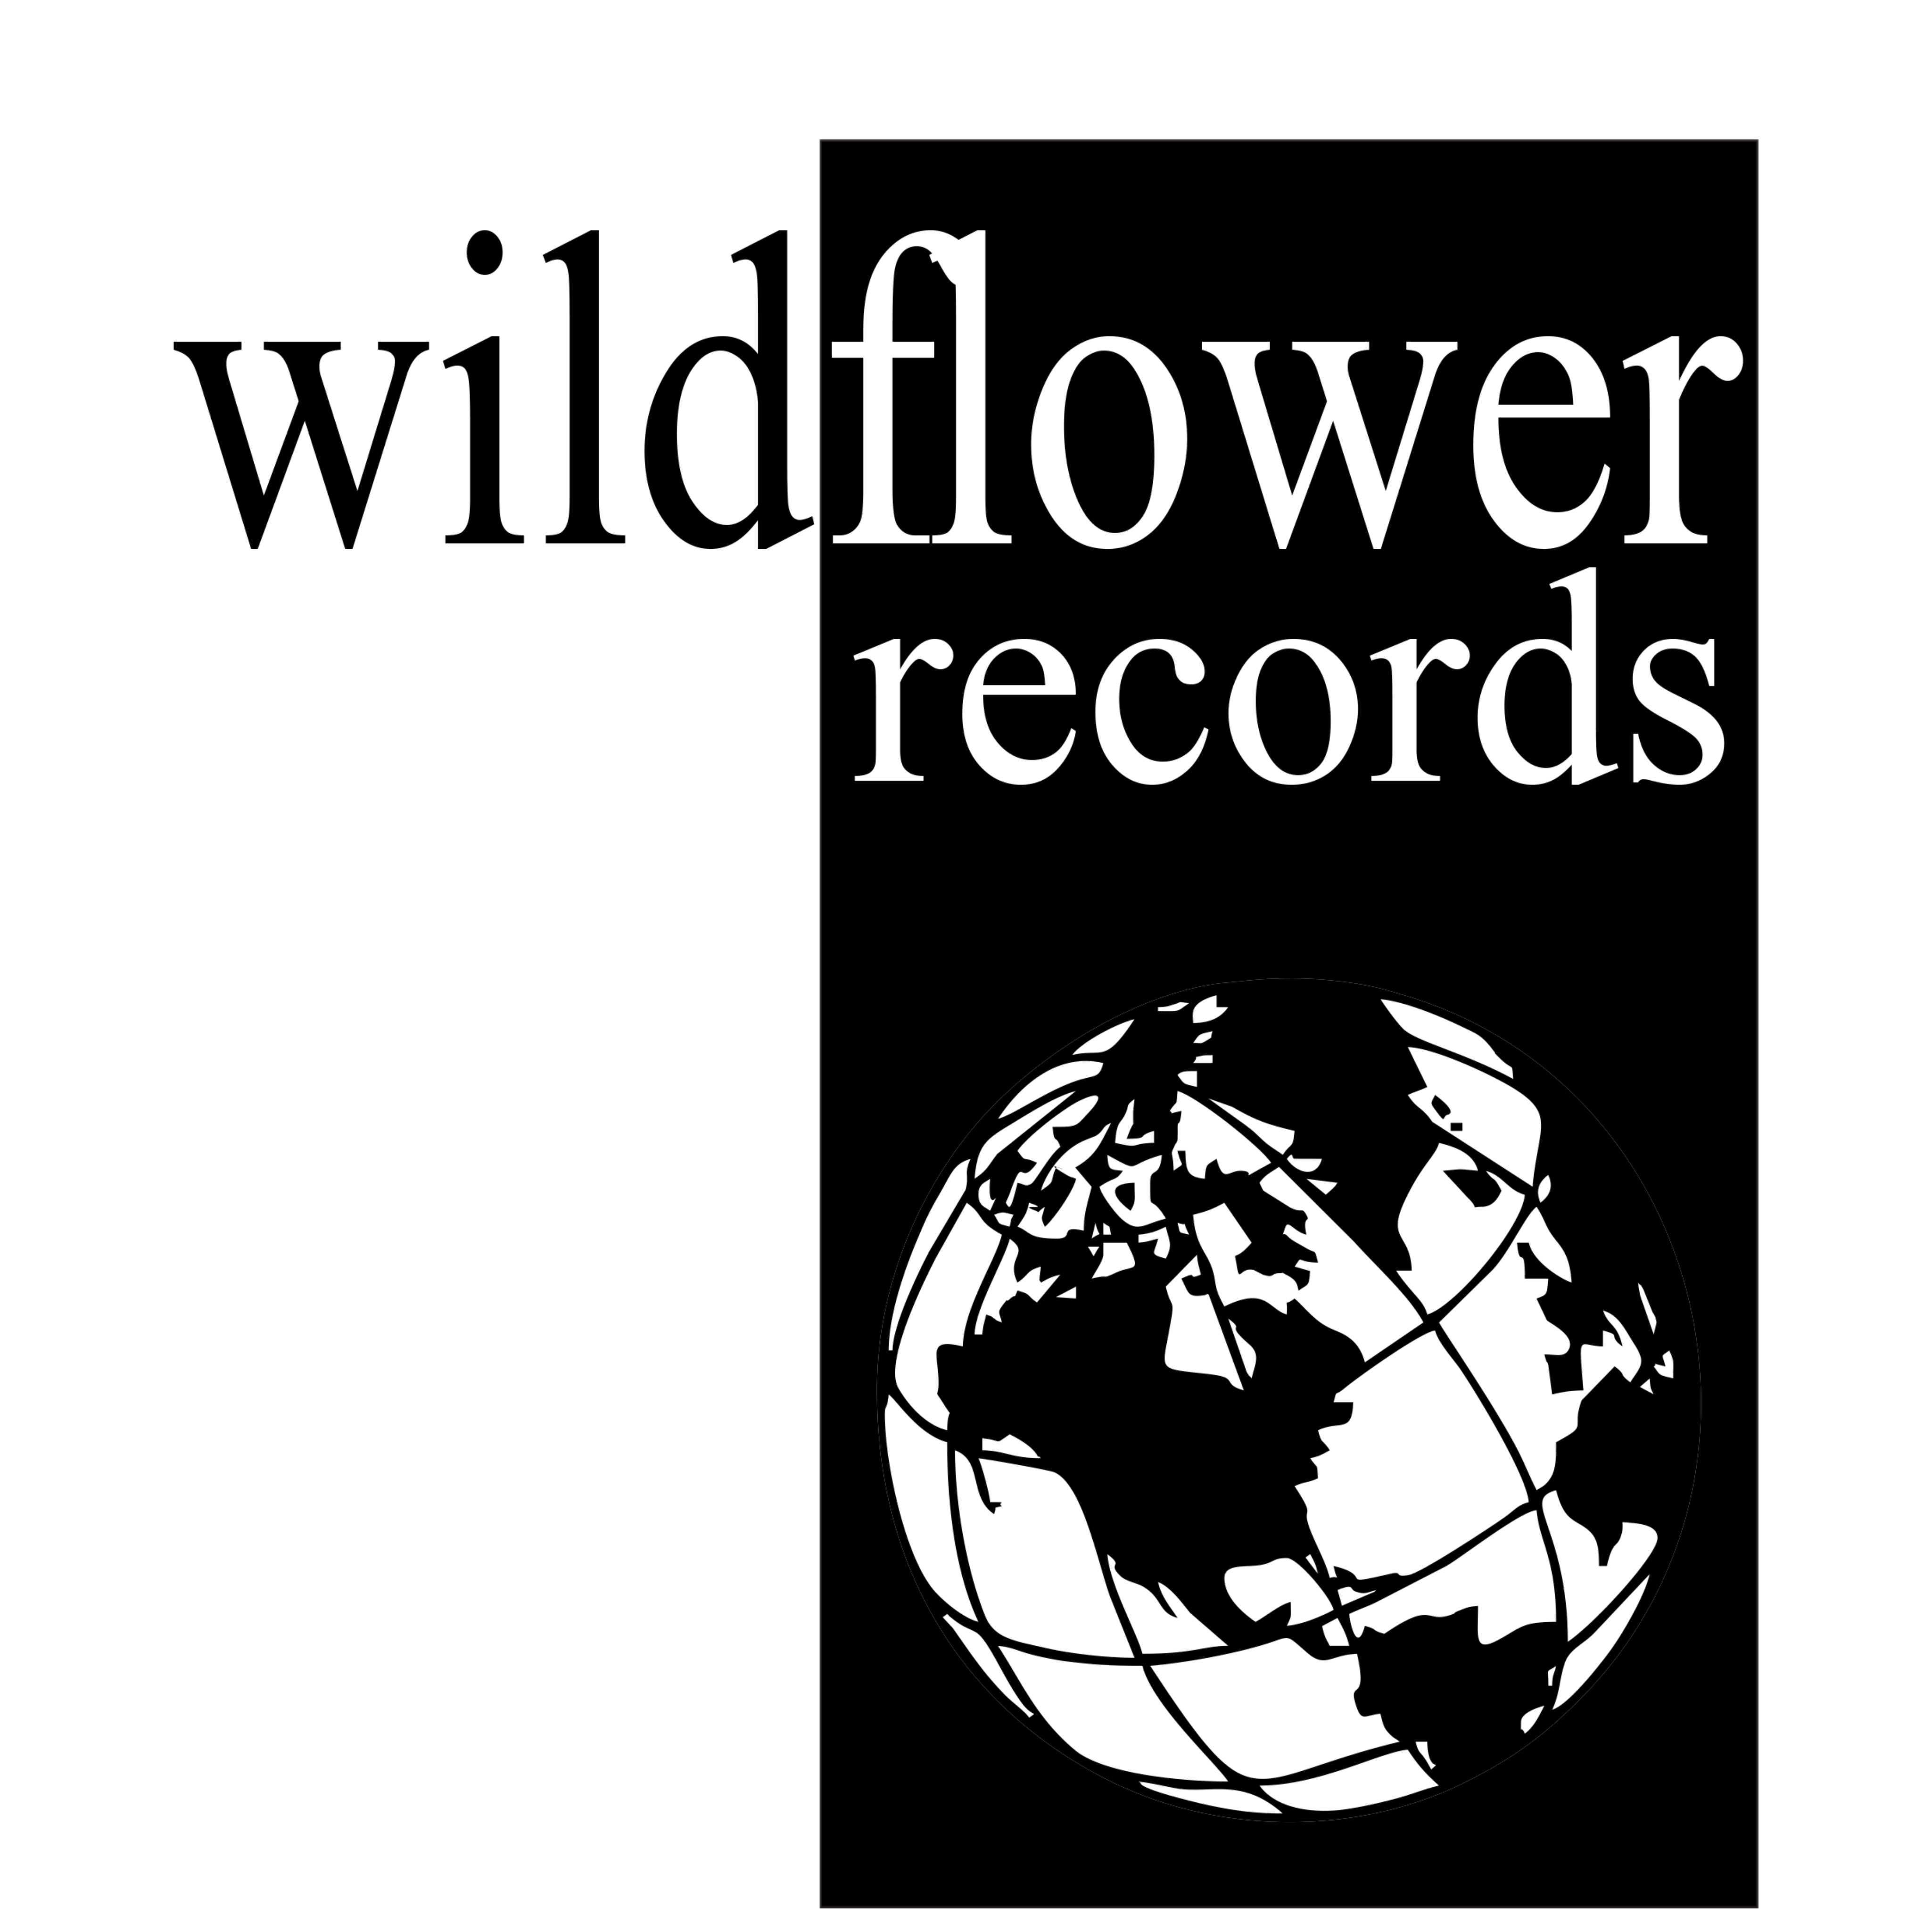 Wildflower Records